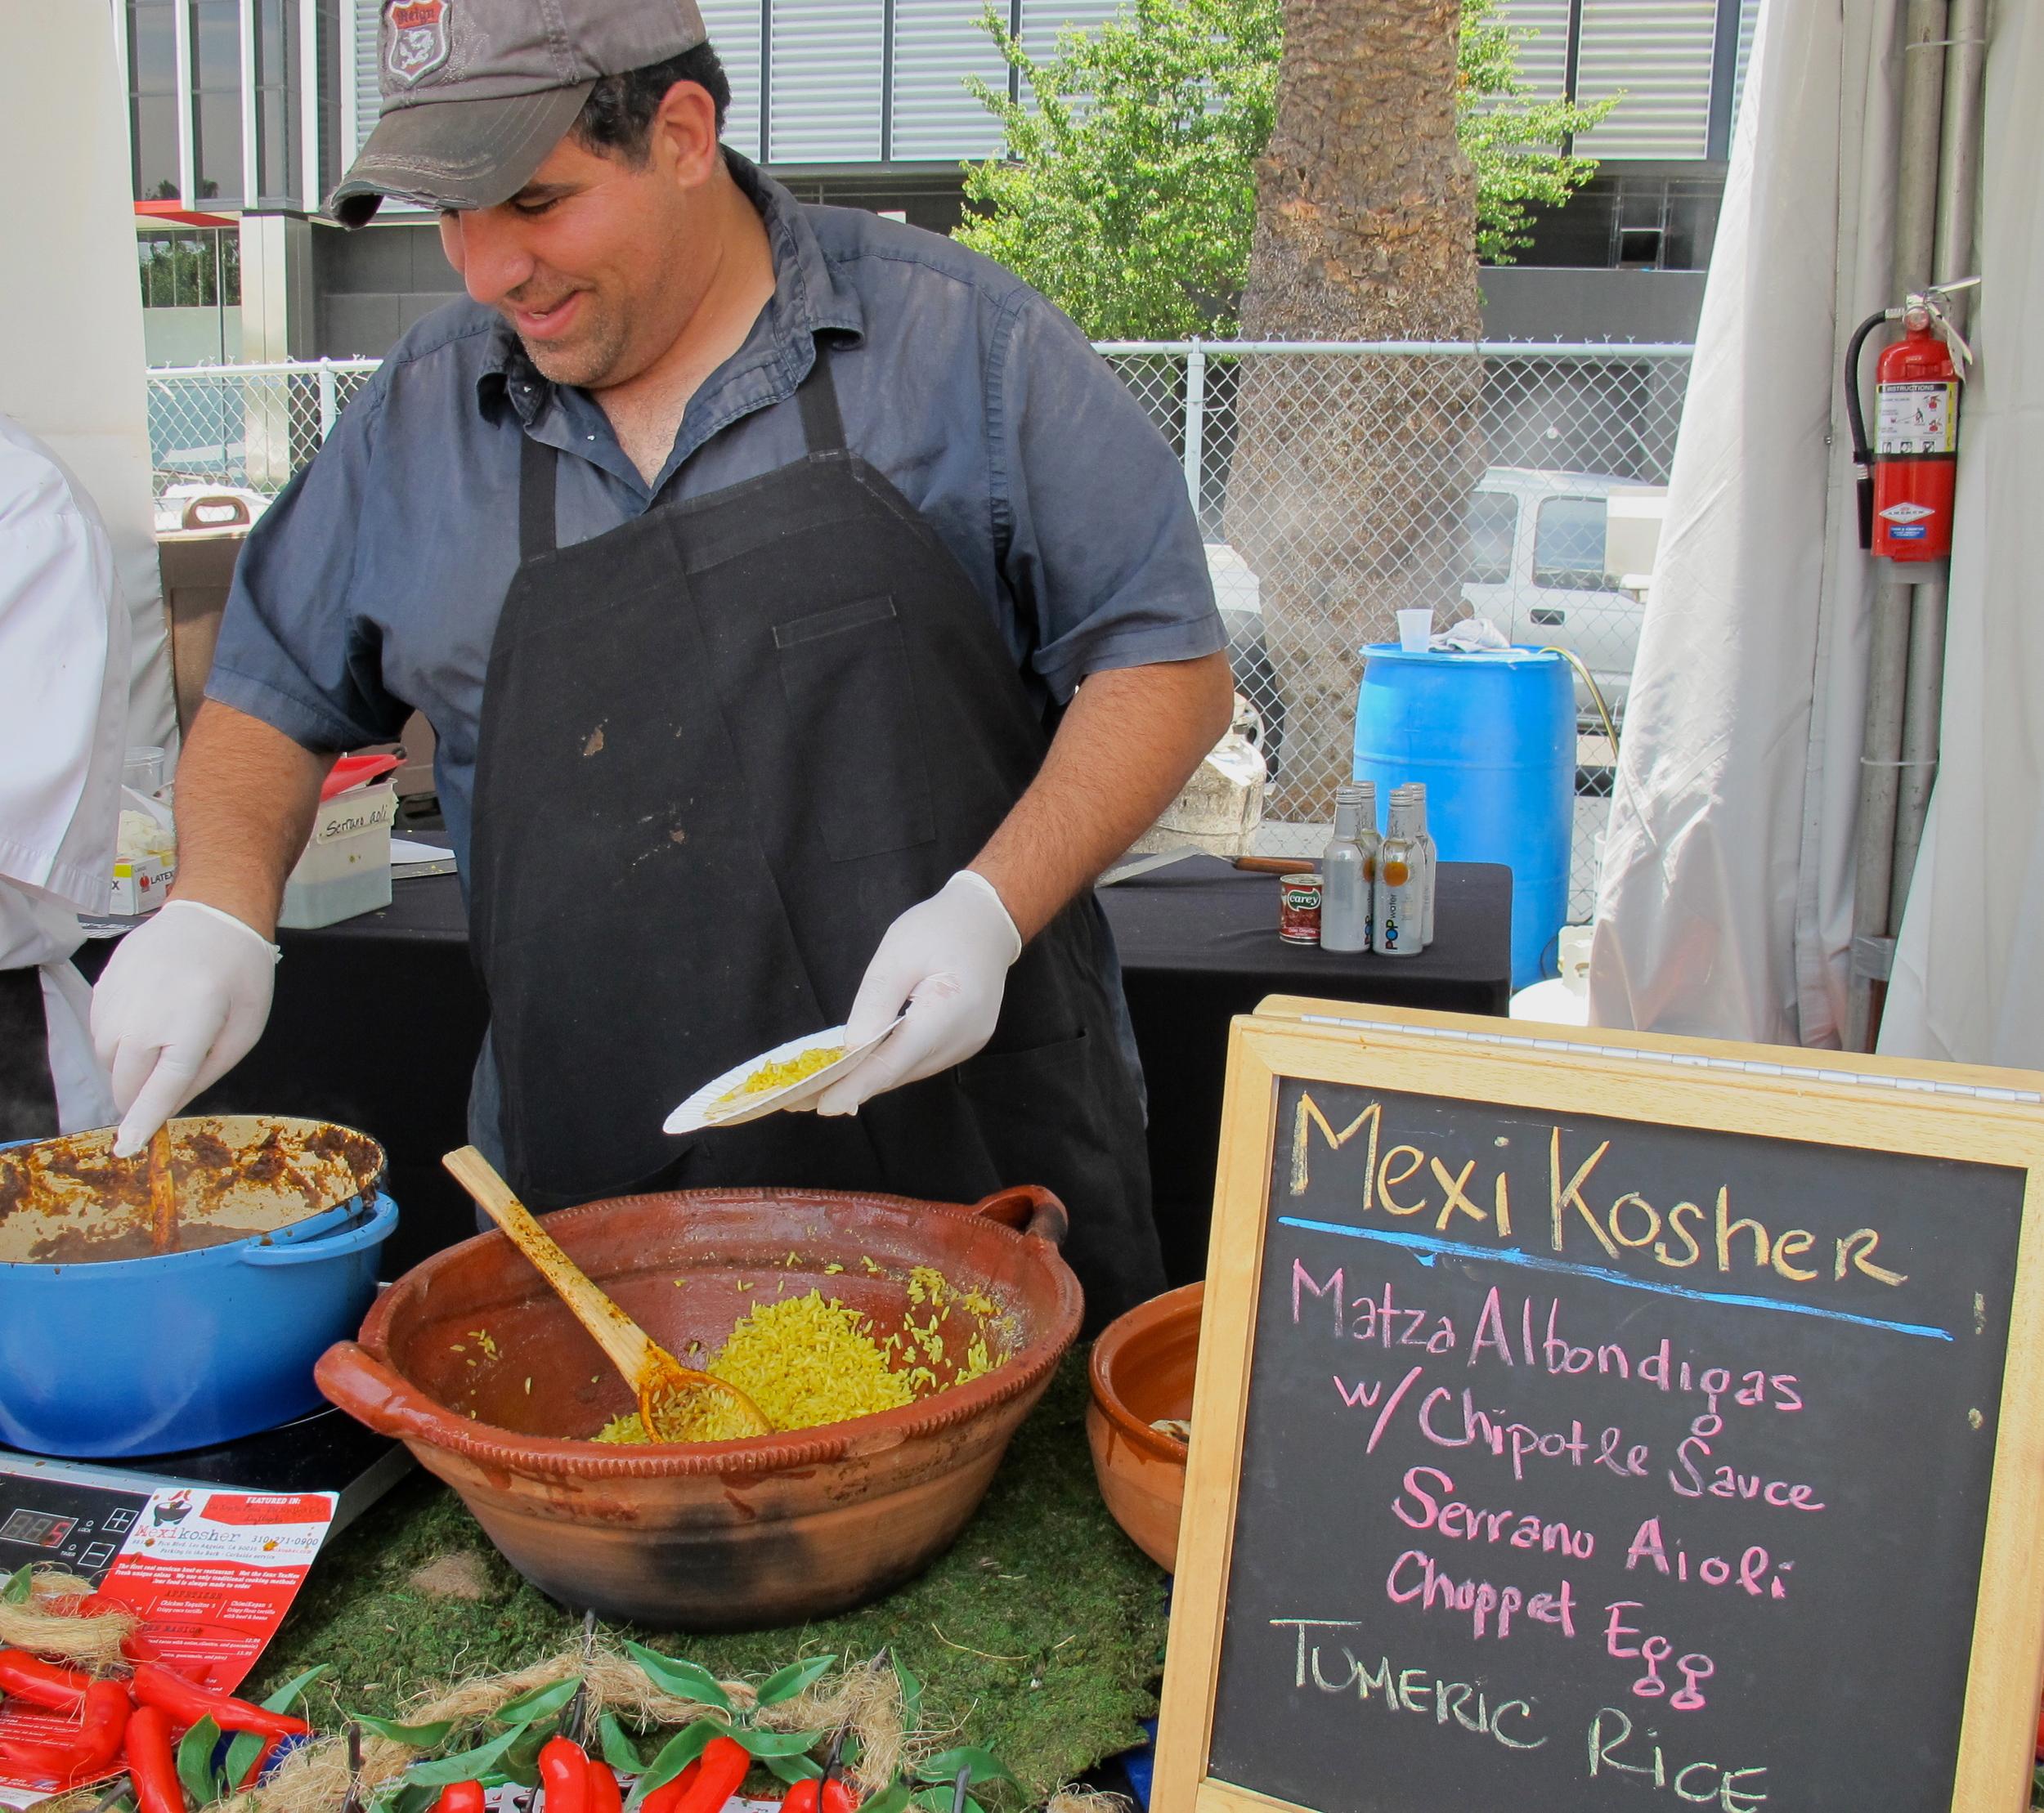 MexiKosher's albondigas taco